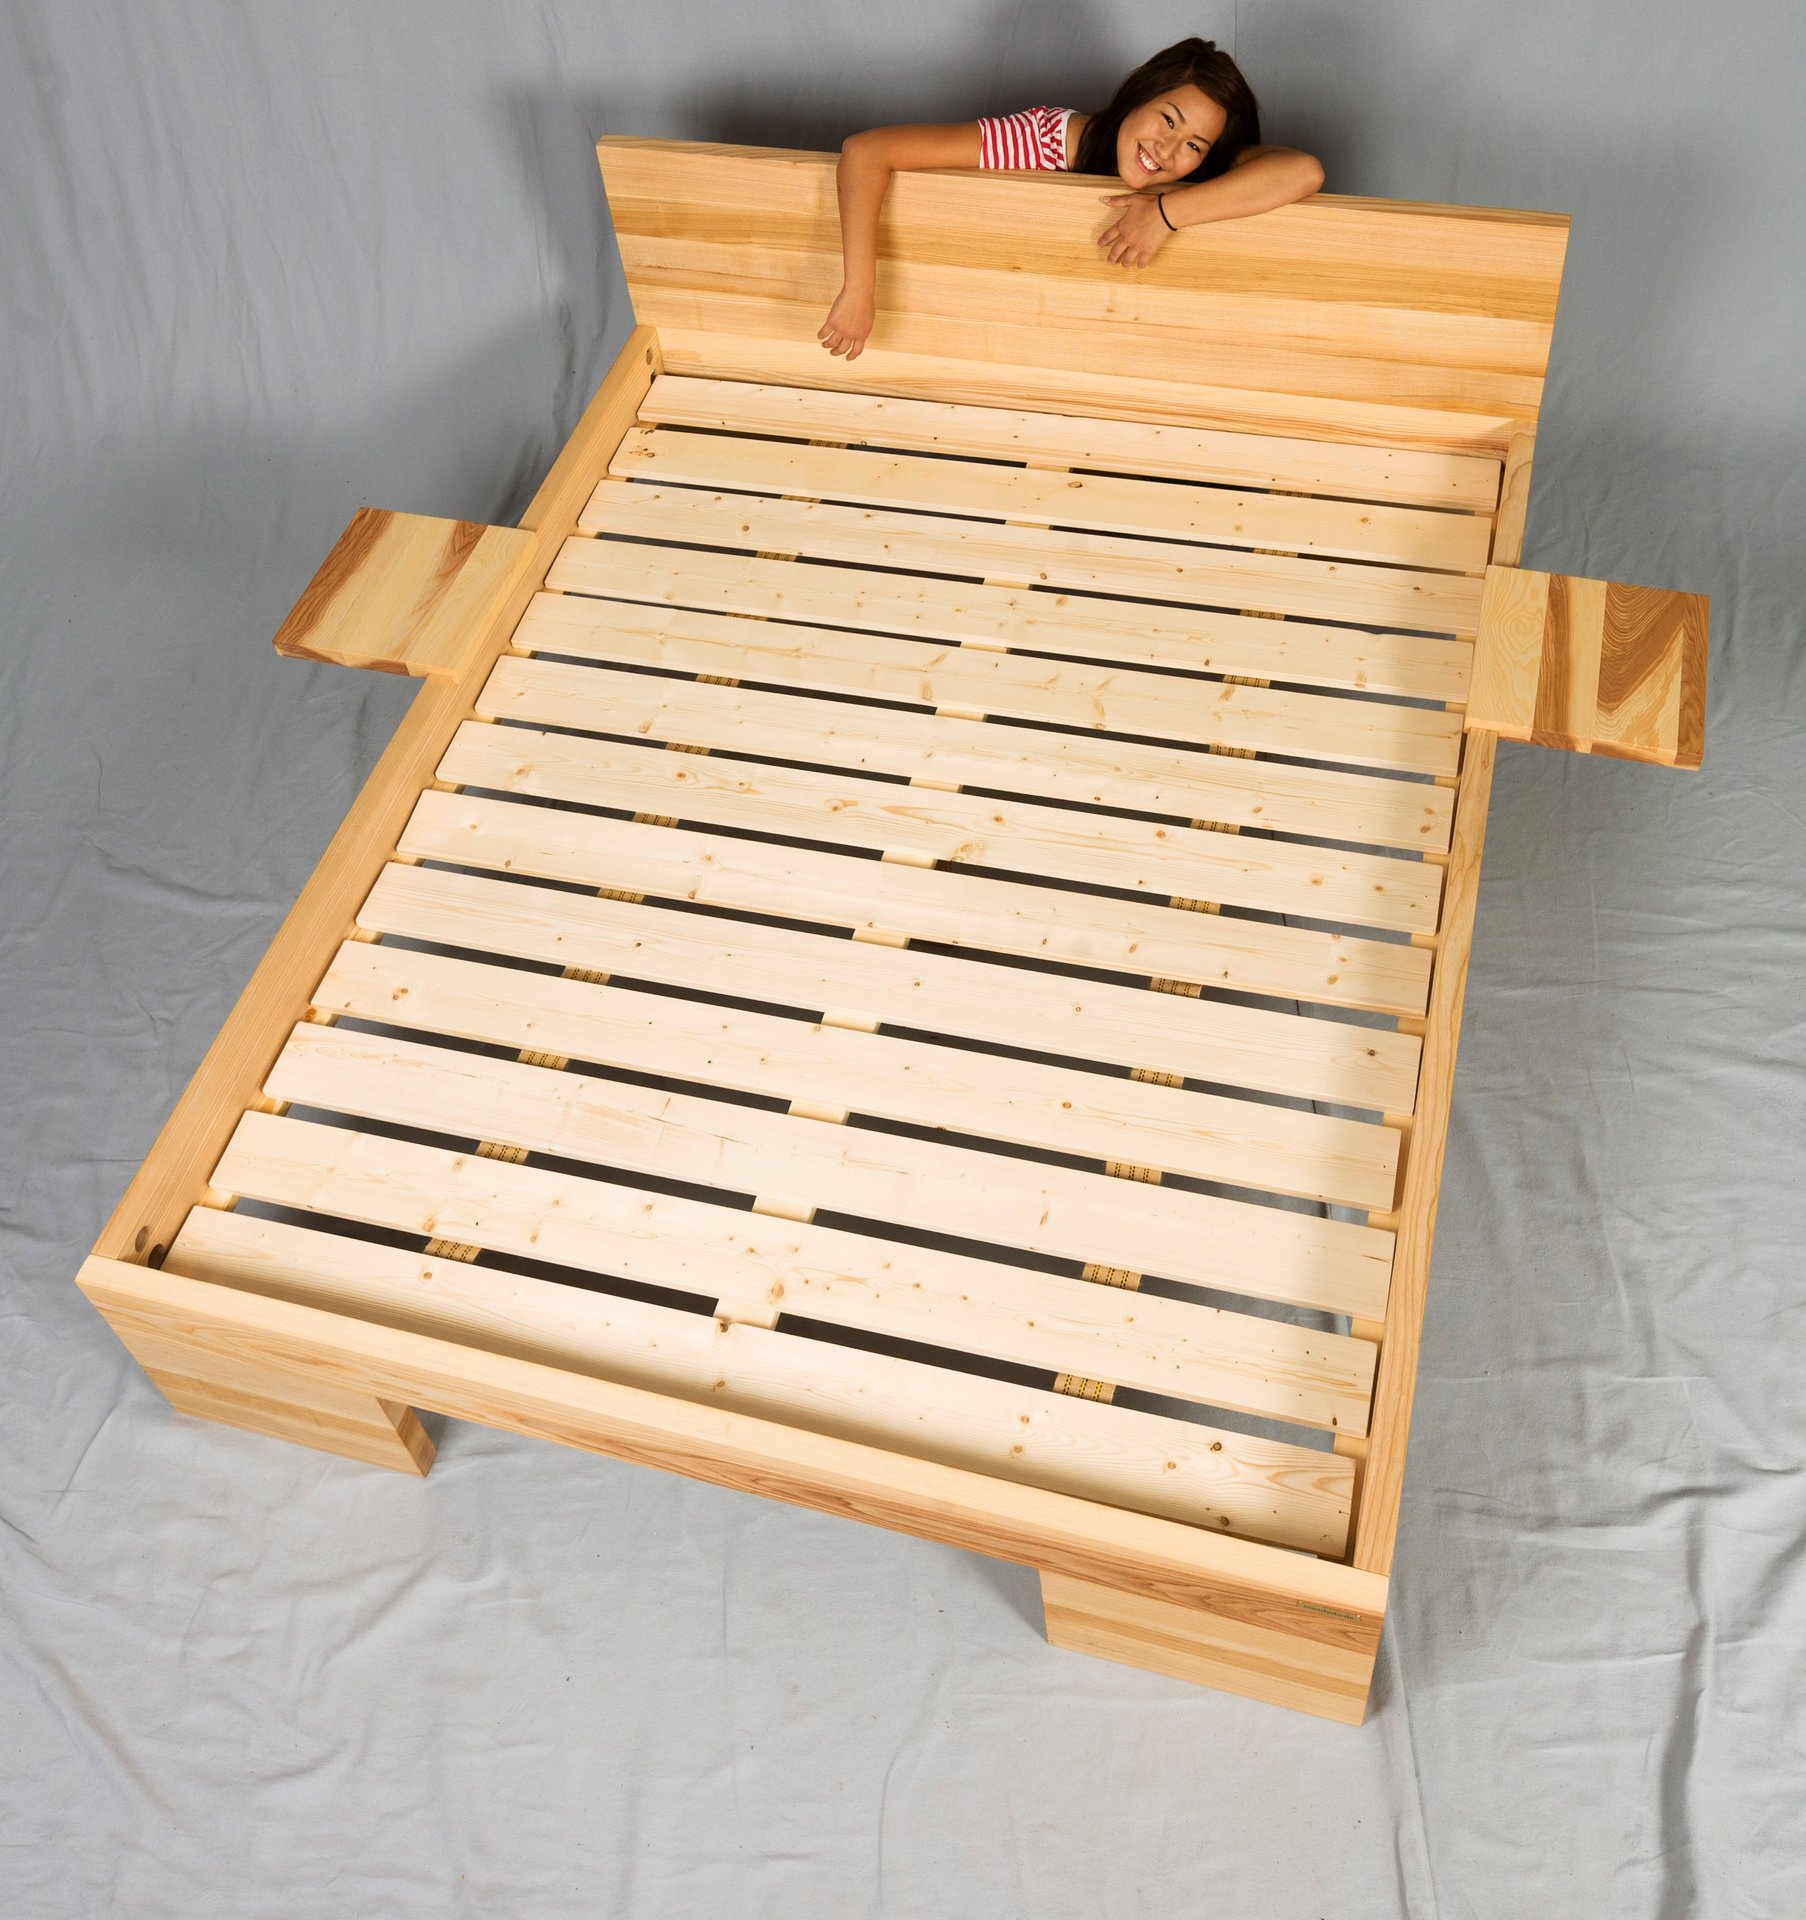 holzbetten mit lattenrost matratze bett g nstig 90 140 120. Black Bedroom Furniture Sets. Home Design Ideas